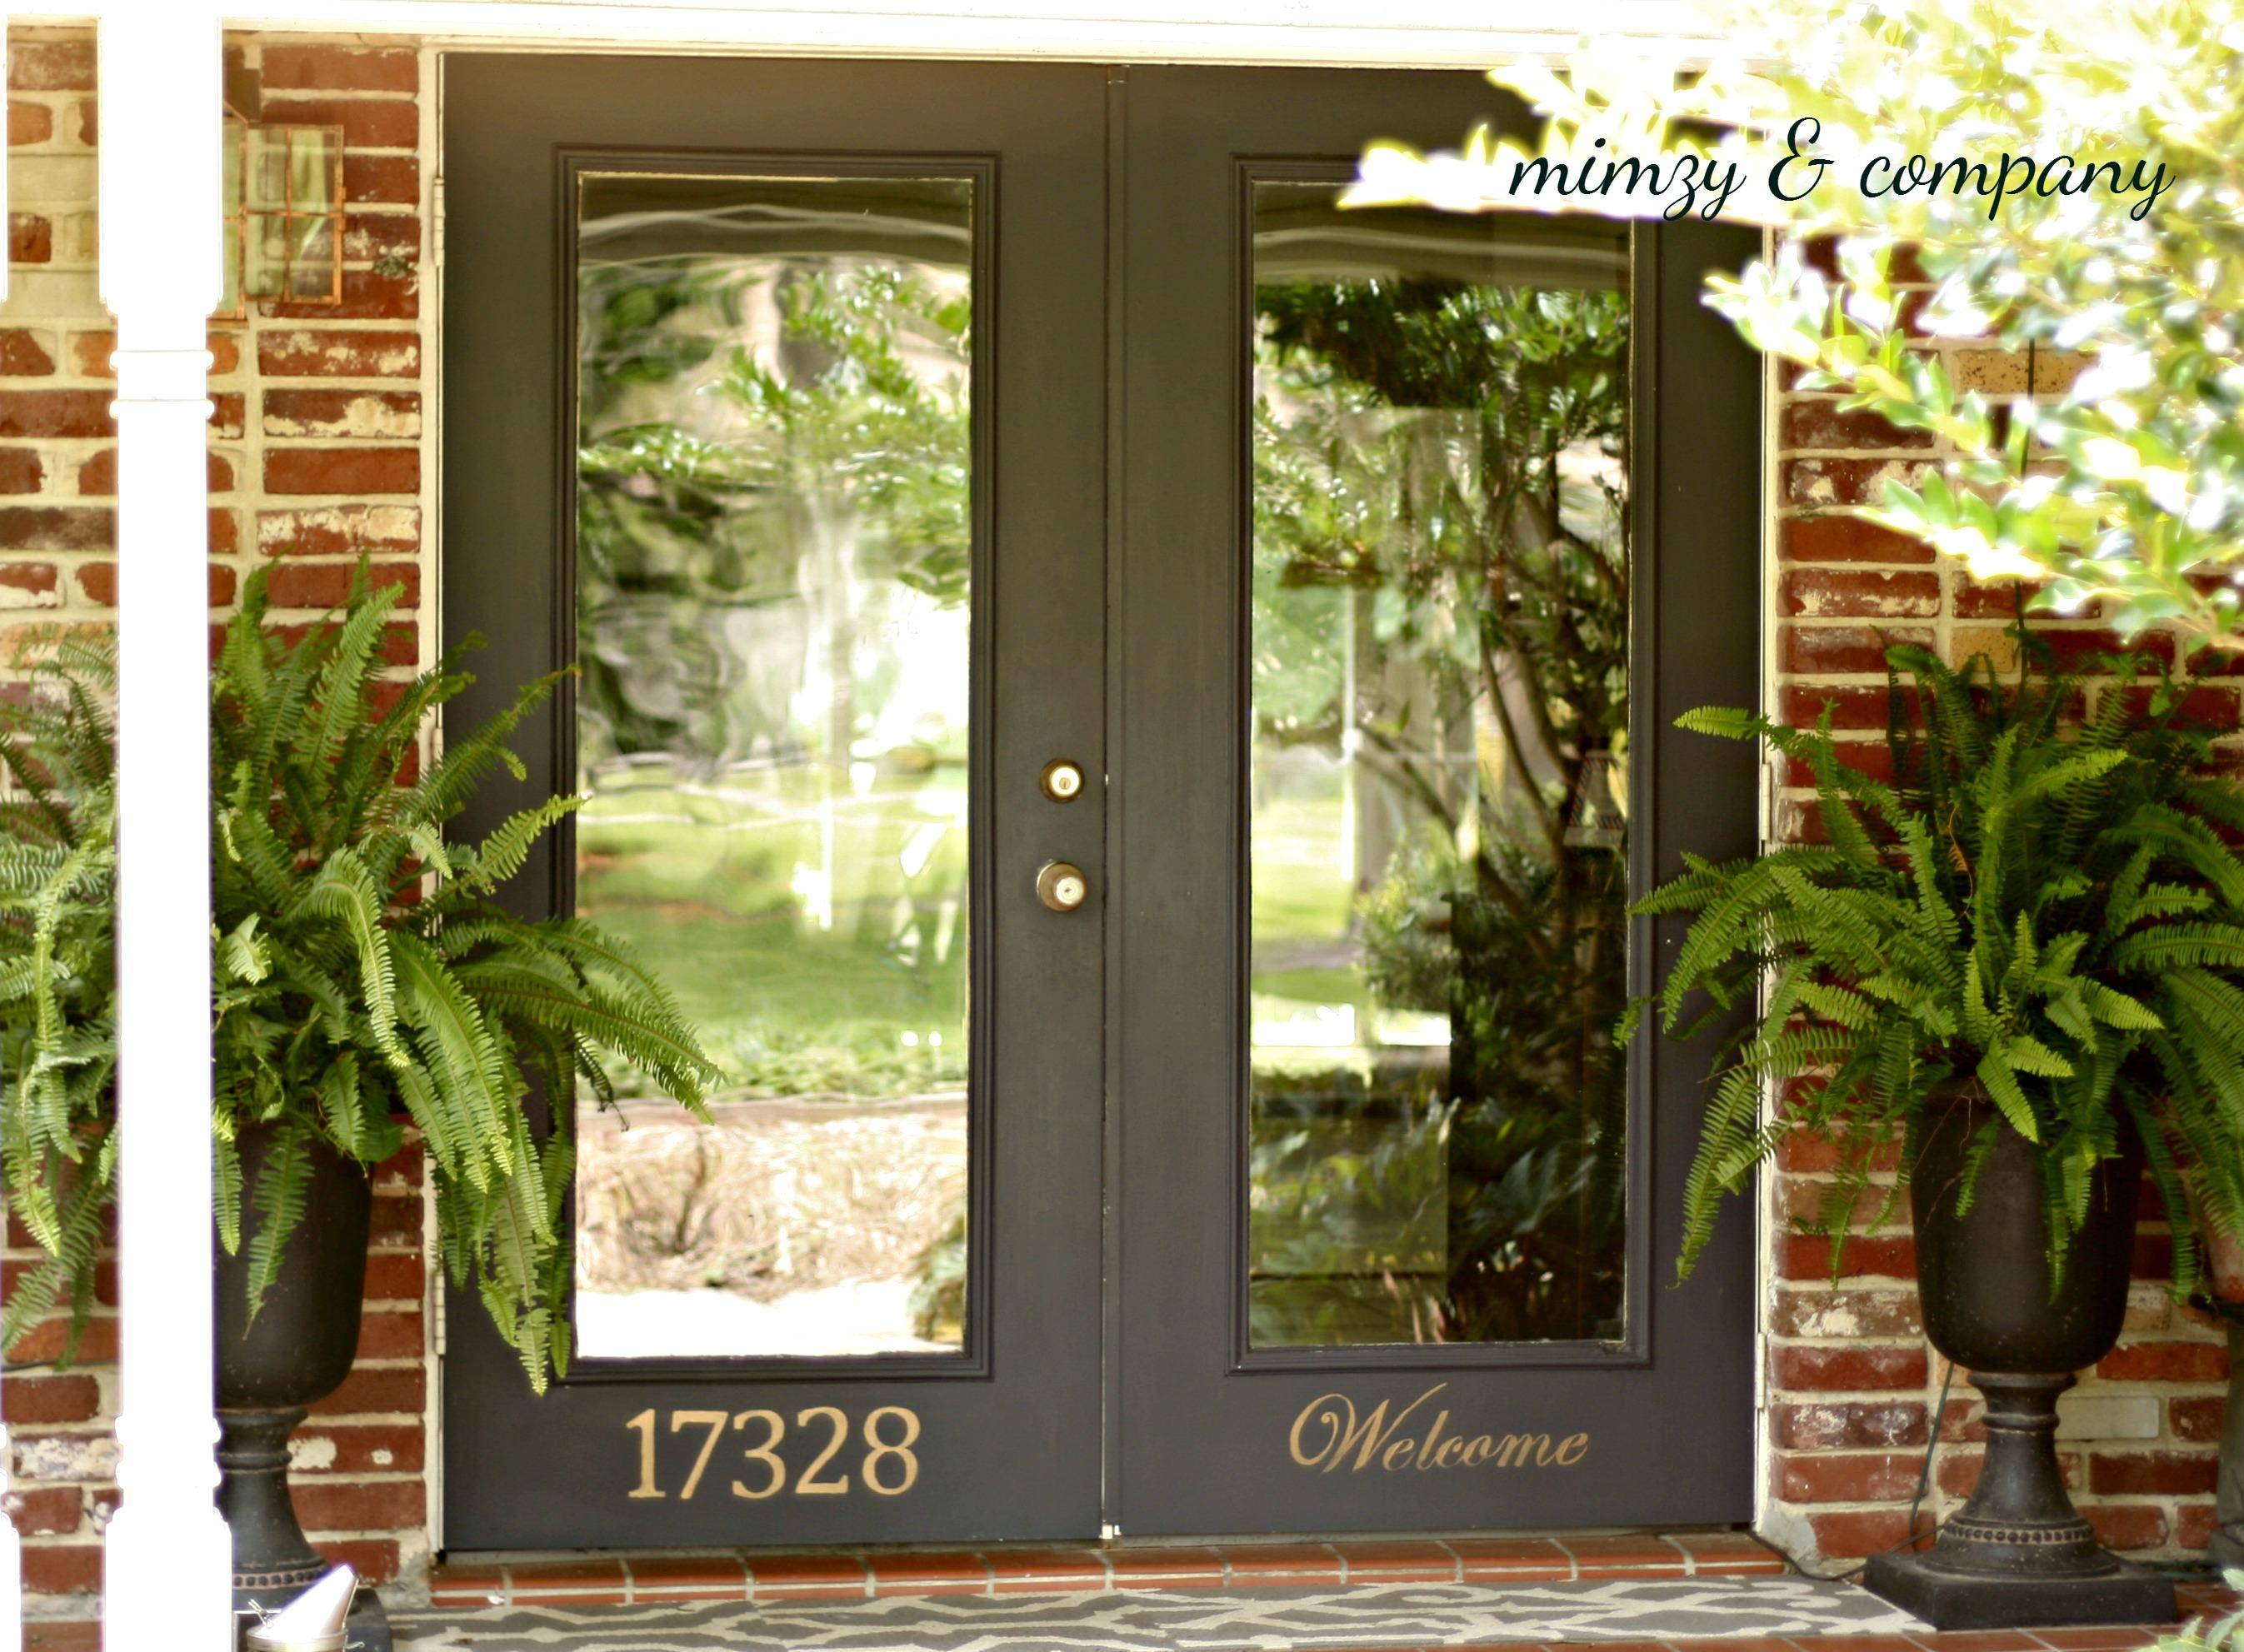 or photo exterior where nantucket jpg cheap design buy portland door breathtaking collection doors front cost simpson to